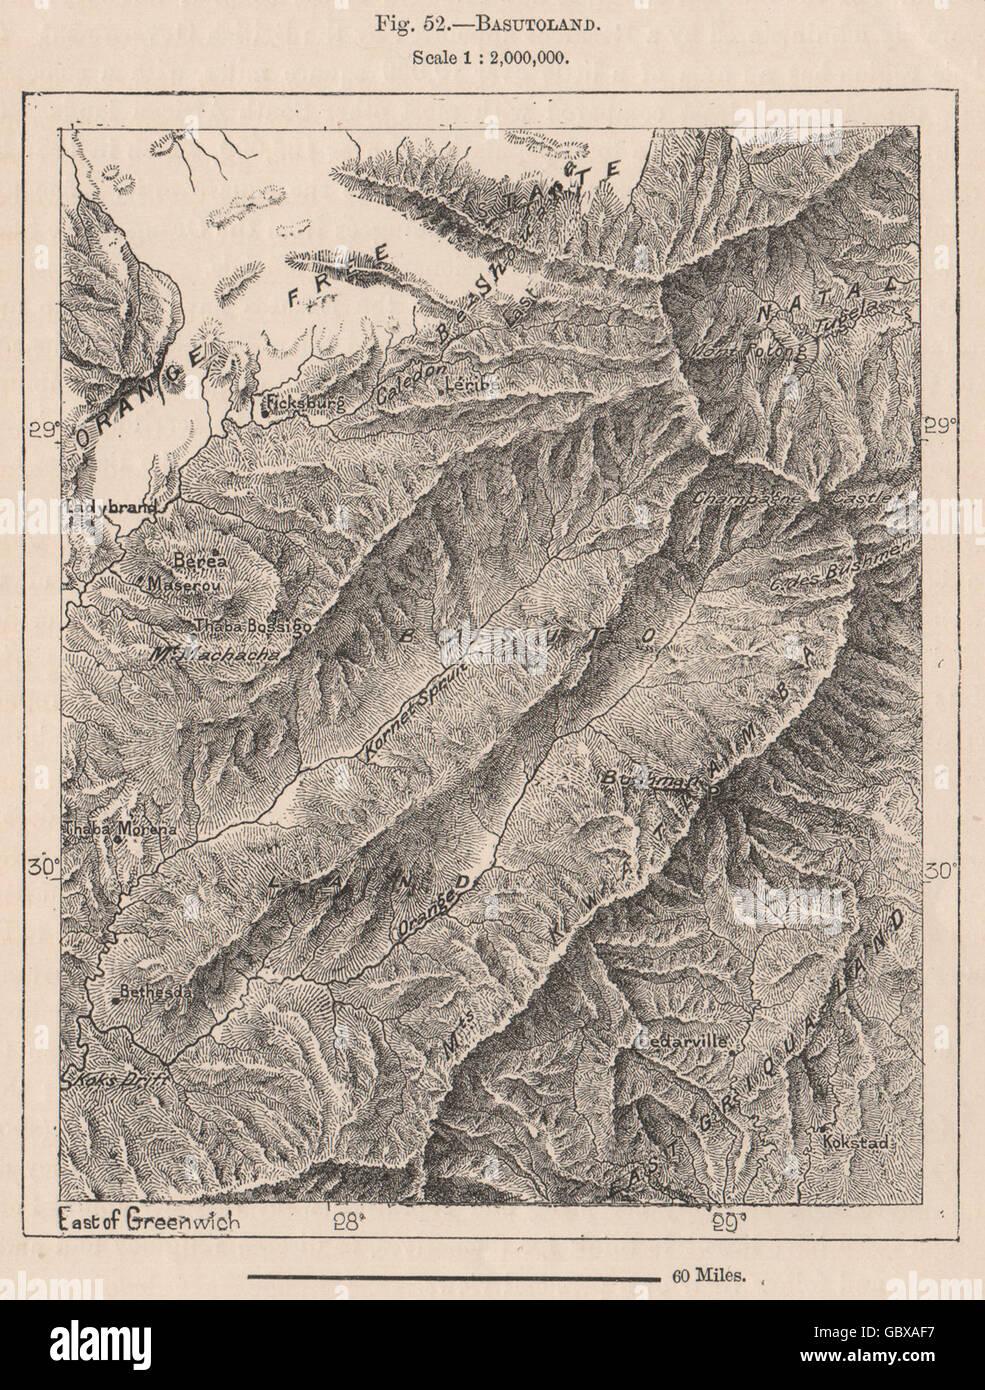 Lesotho. Lesotho, 1885 antique map - Stock Image